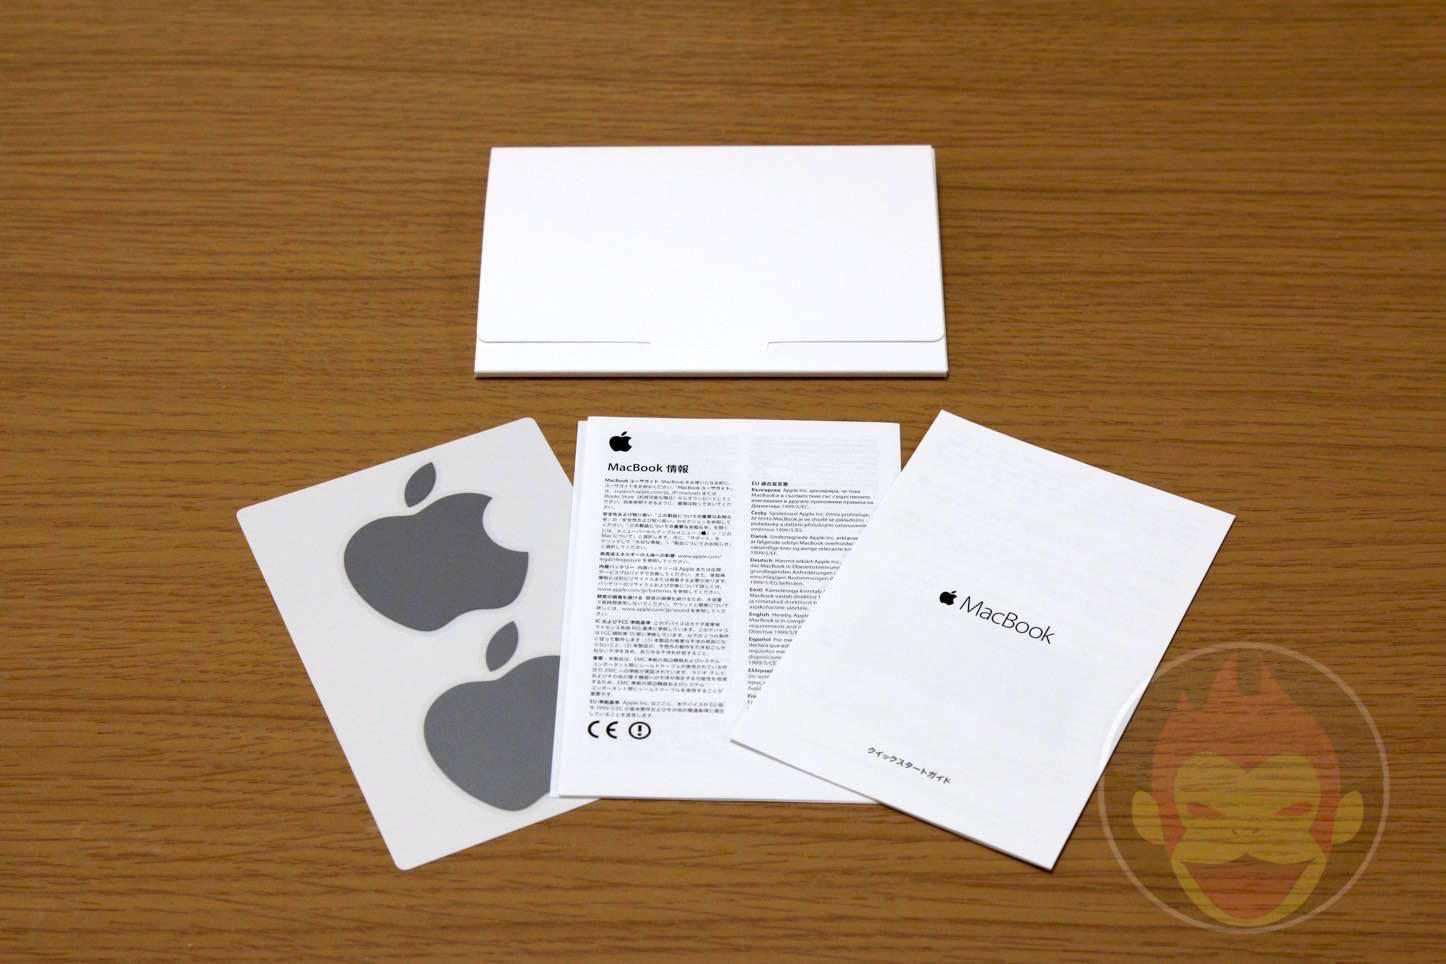 12inch-The-New-MacBook-30.JPG